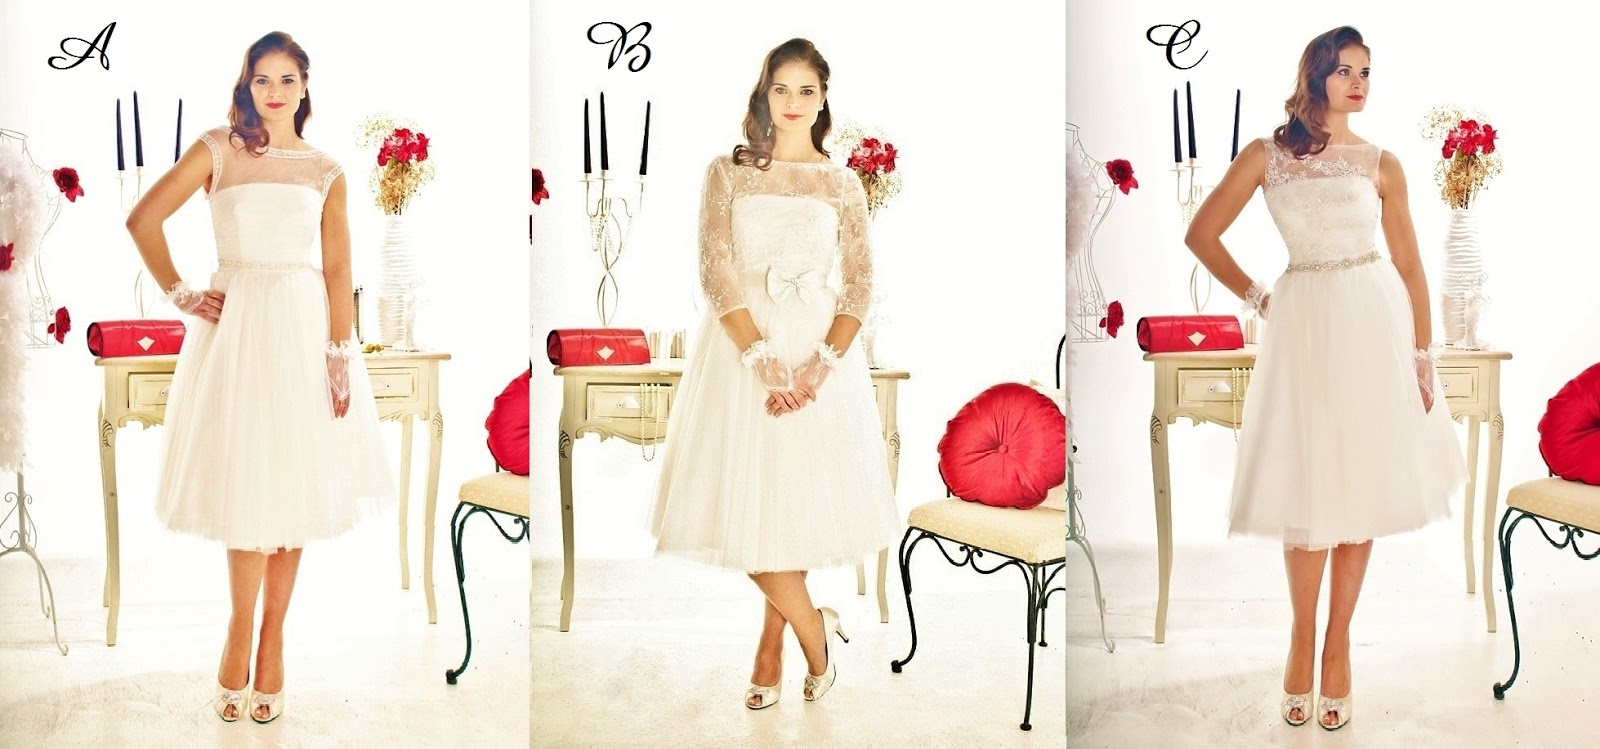 vintage 50s style wedding dresses 50s style wedding dresses 50s style vintage wedding dresses